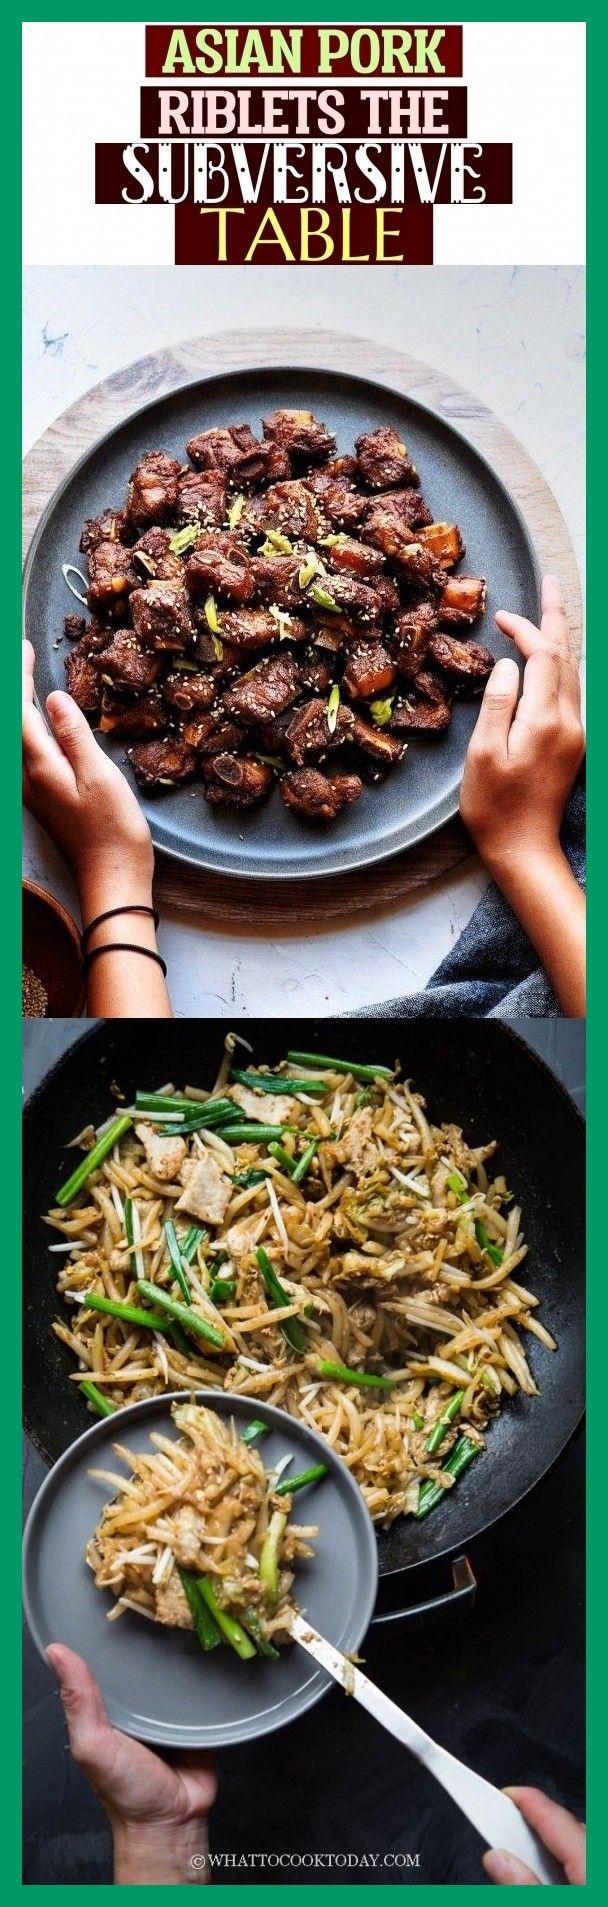 Photo of Asian Pork Riblets The Subversive Table Asian Pork Riblets Die Subversive Tabelle | Christmas Recipes